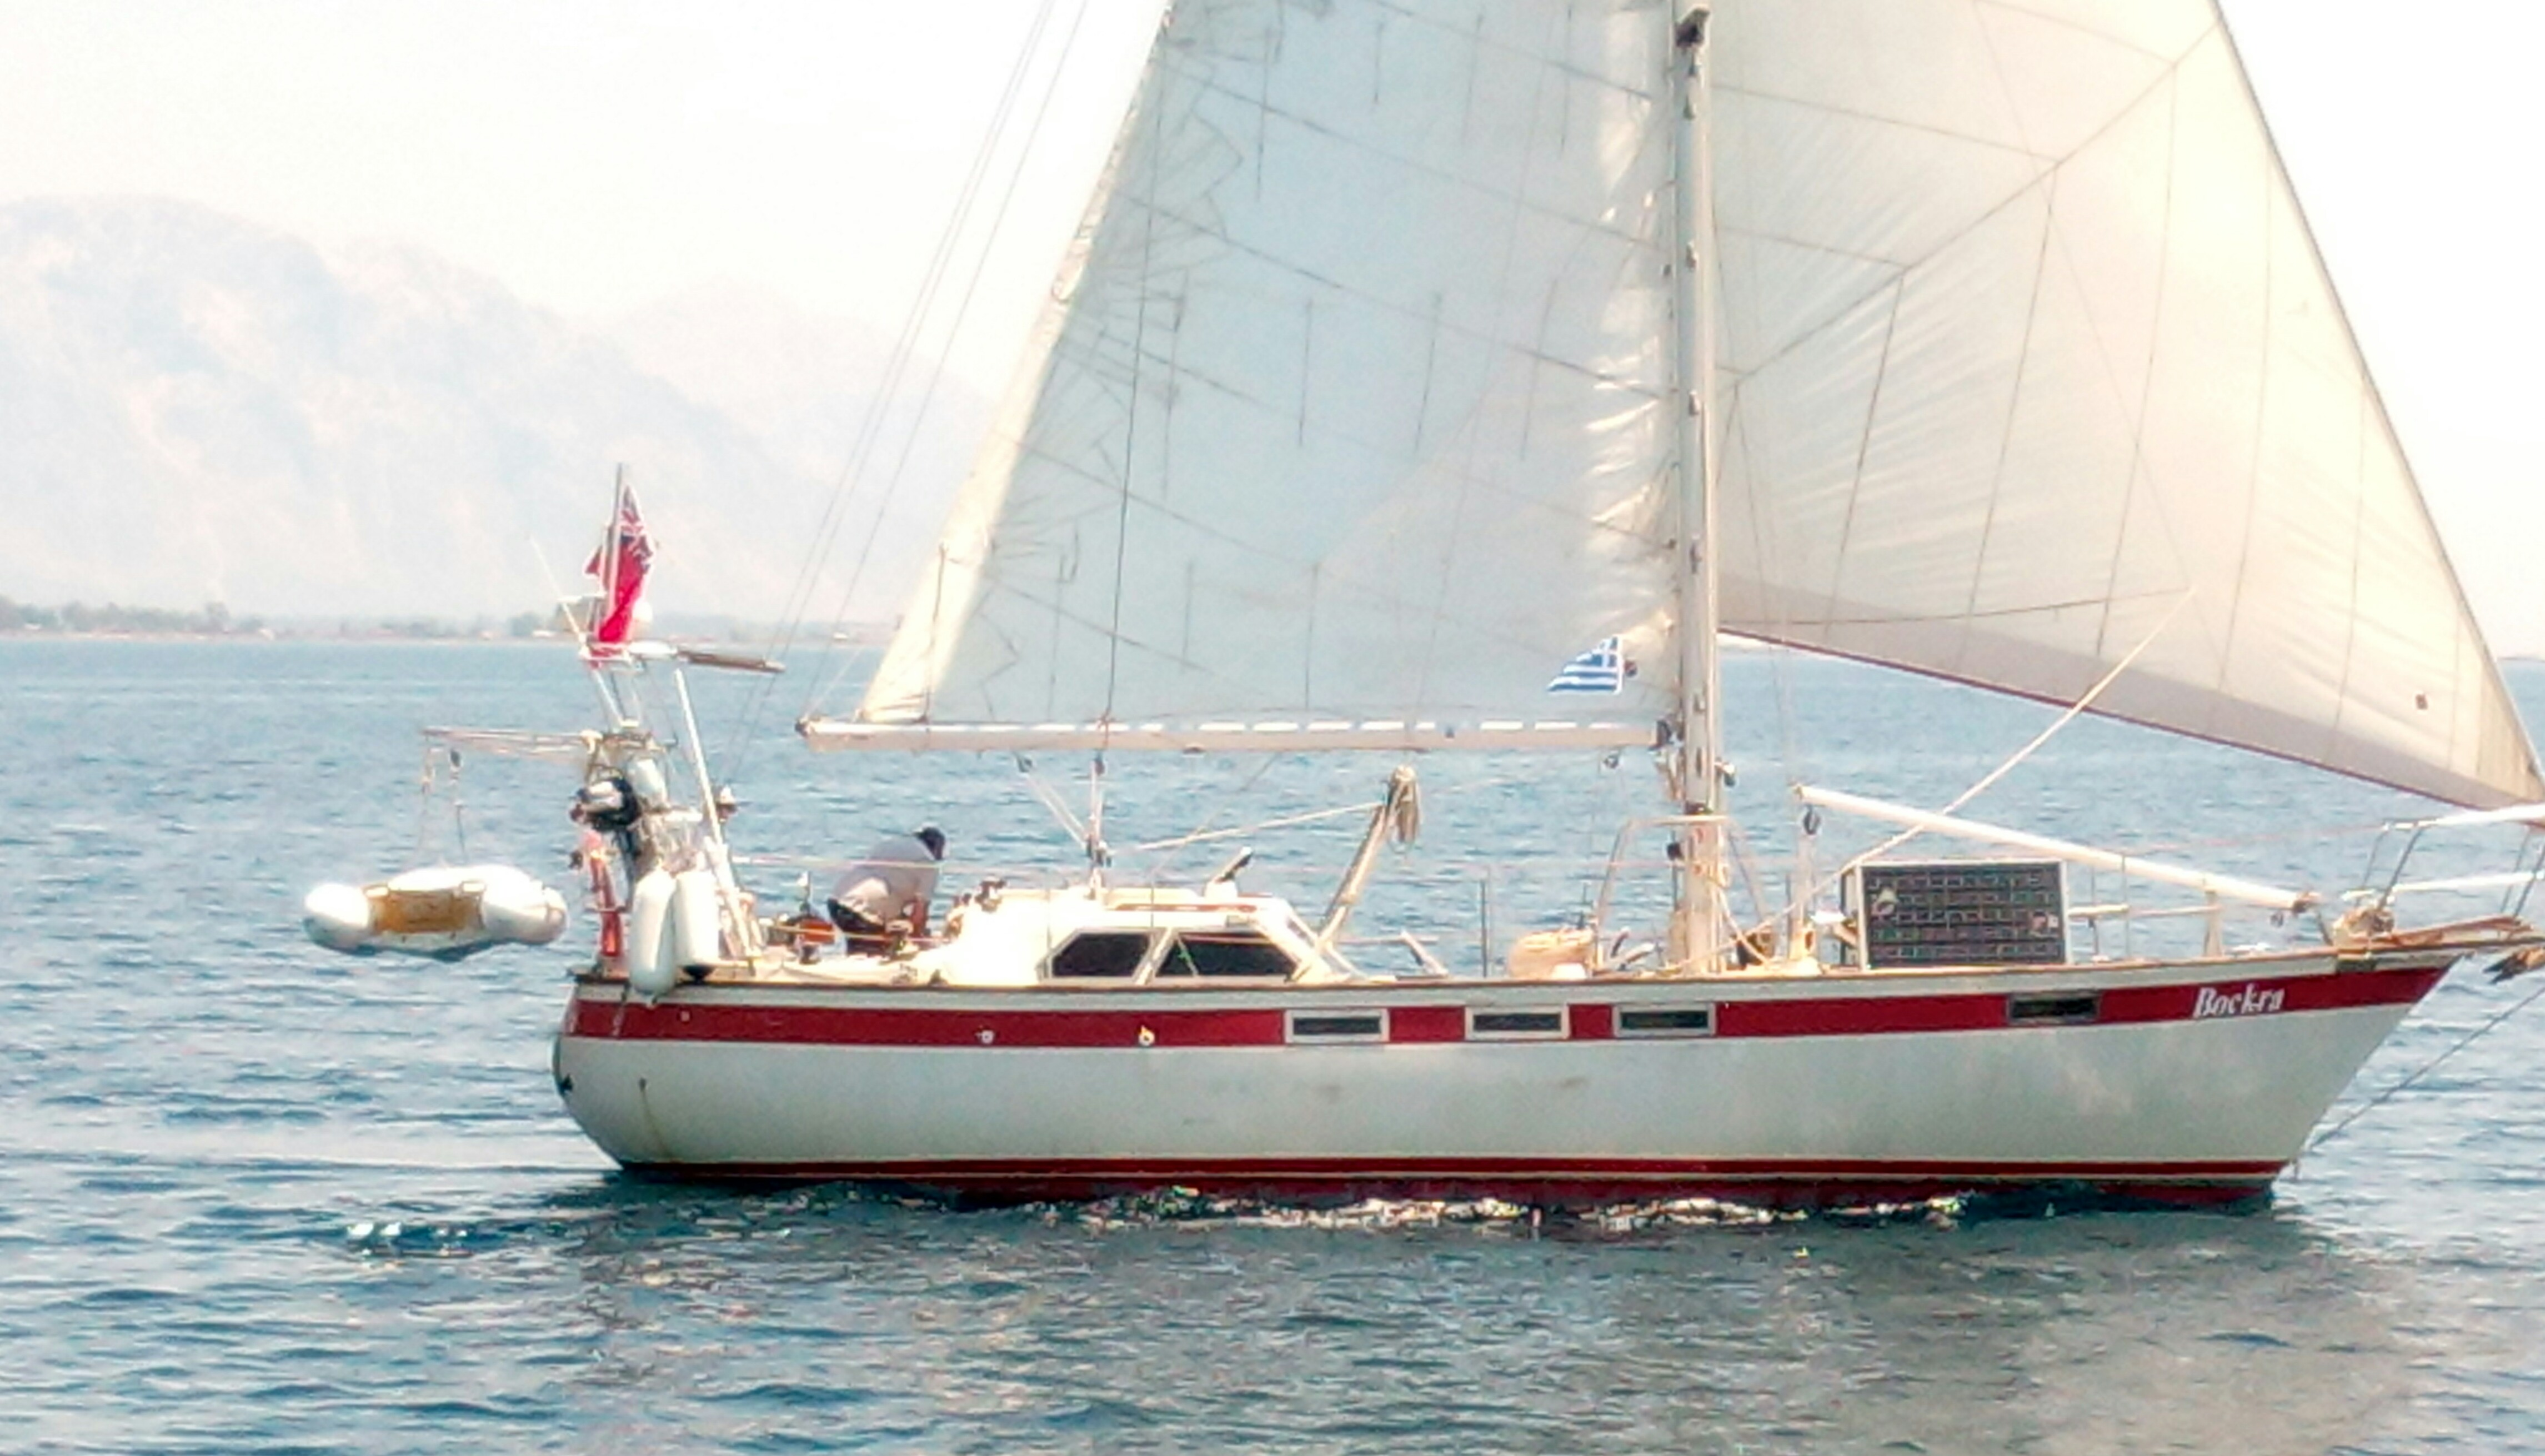 123 - Bockra - abeam